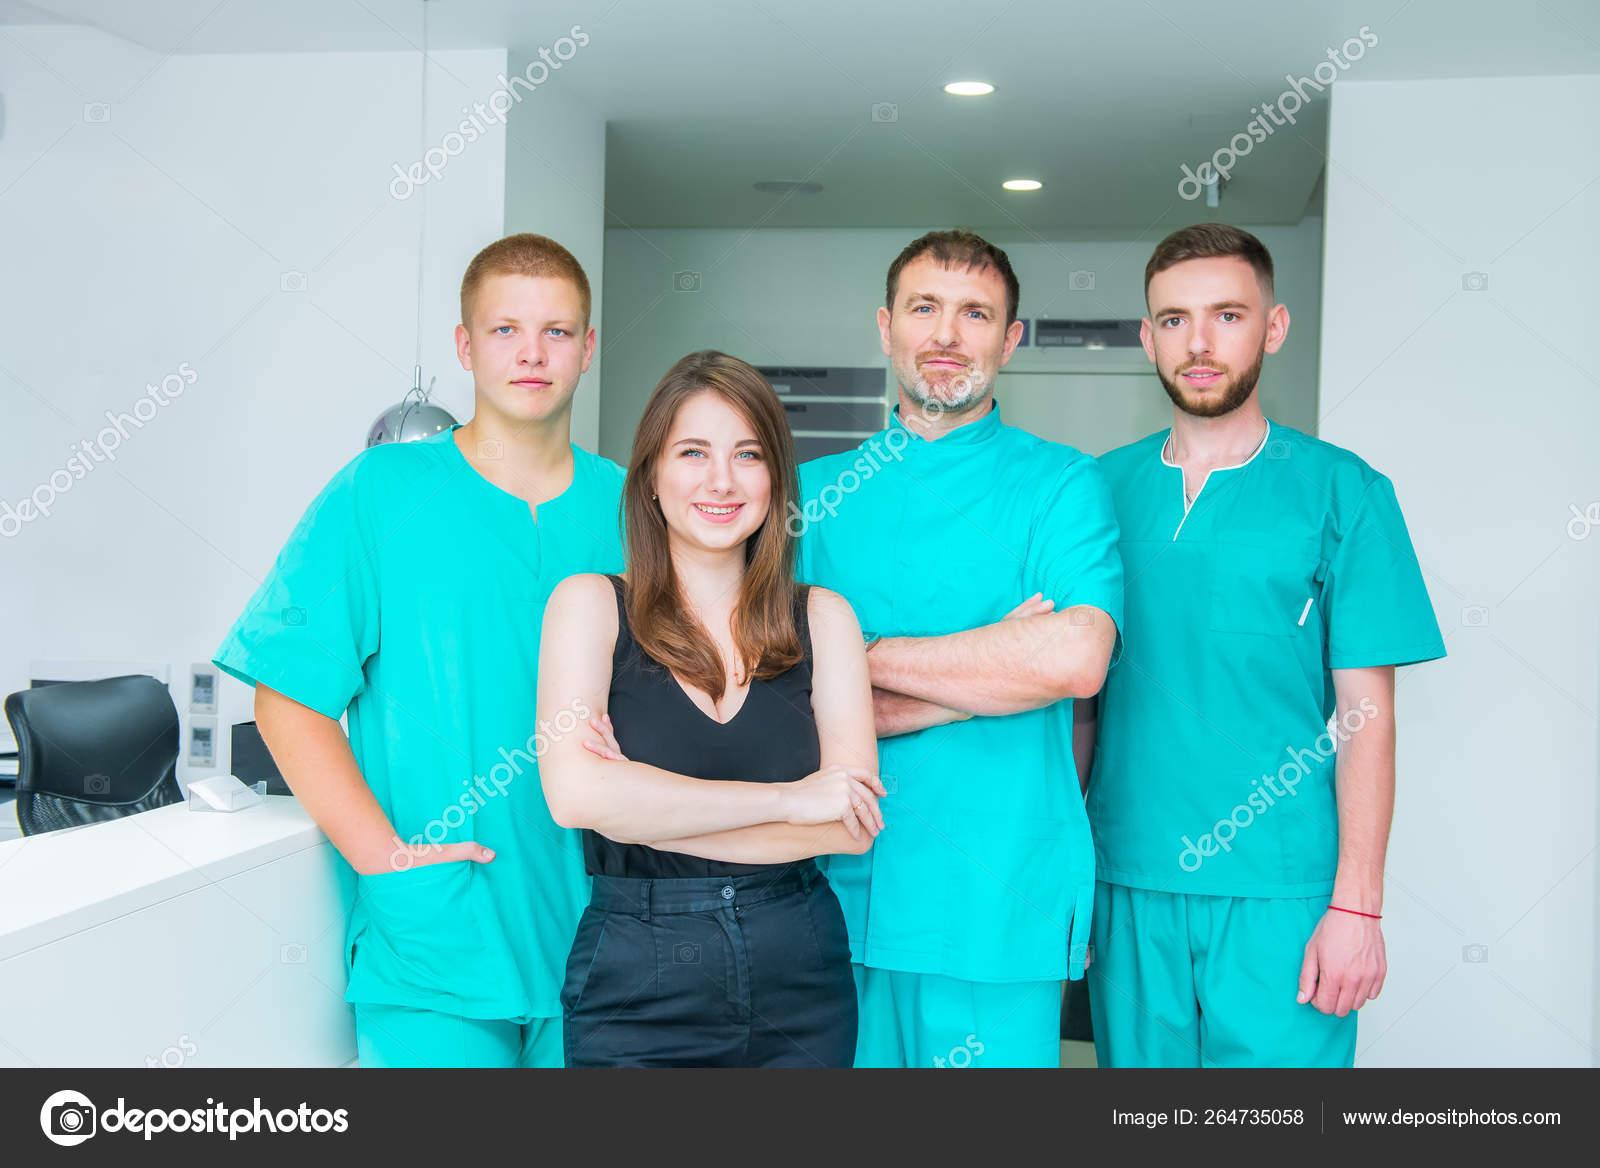 Smiling portrait team in uniform providing healthcare treatment in